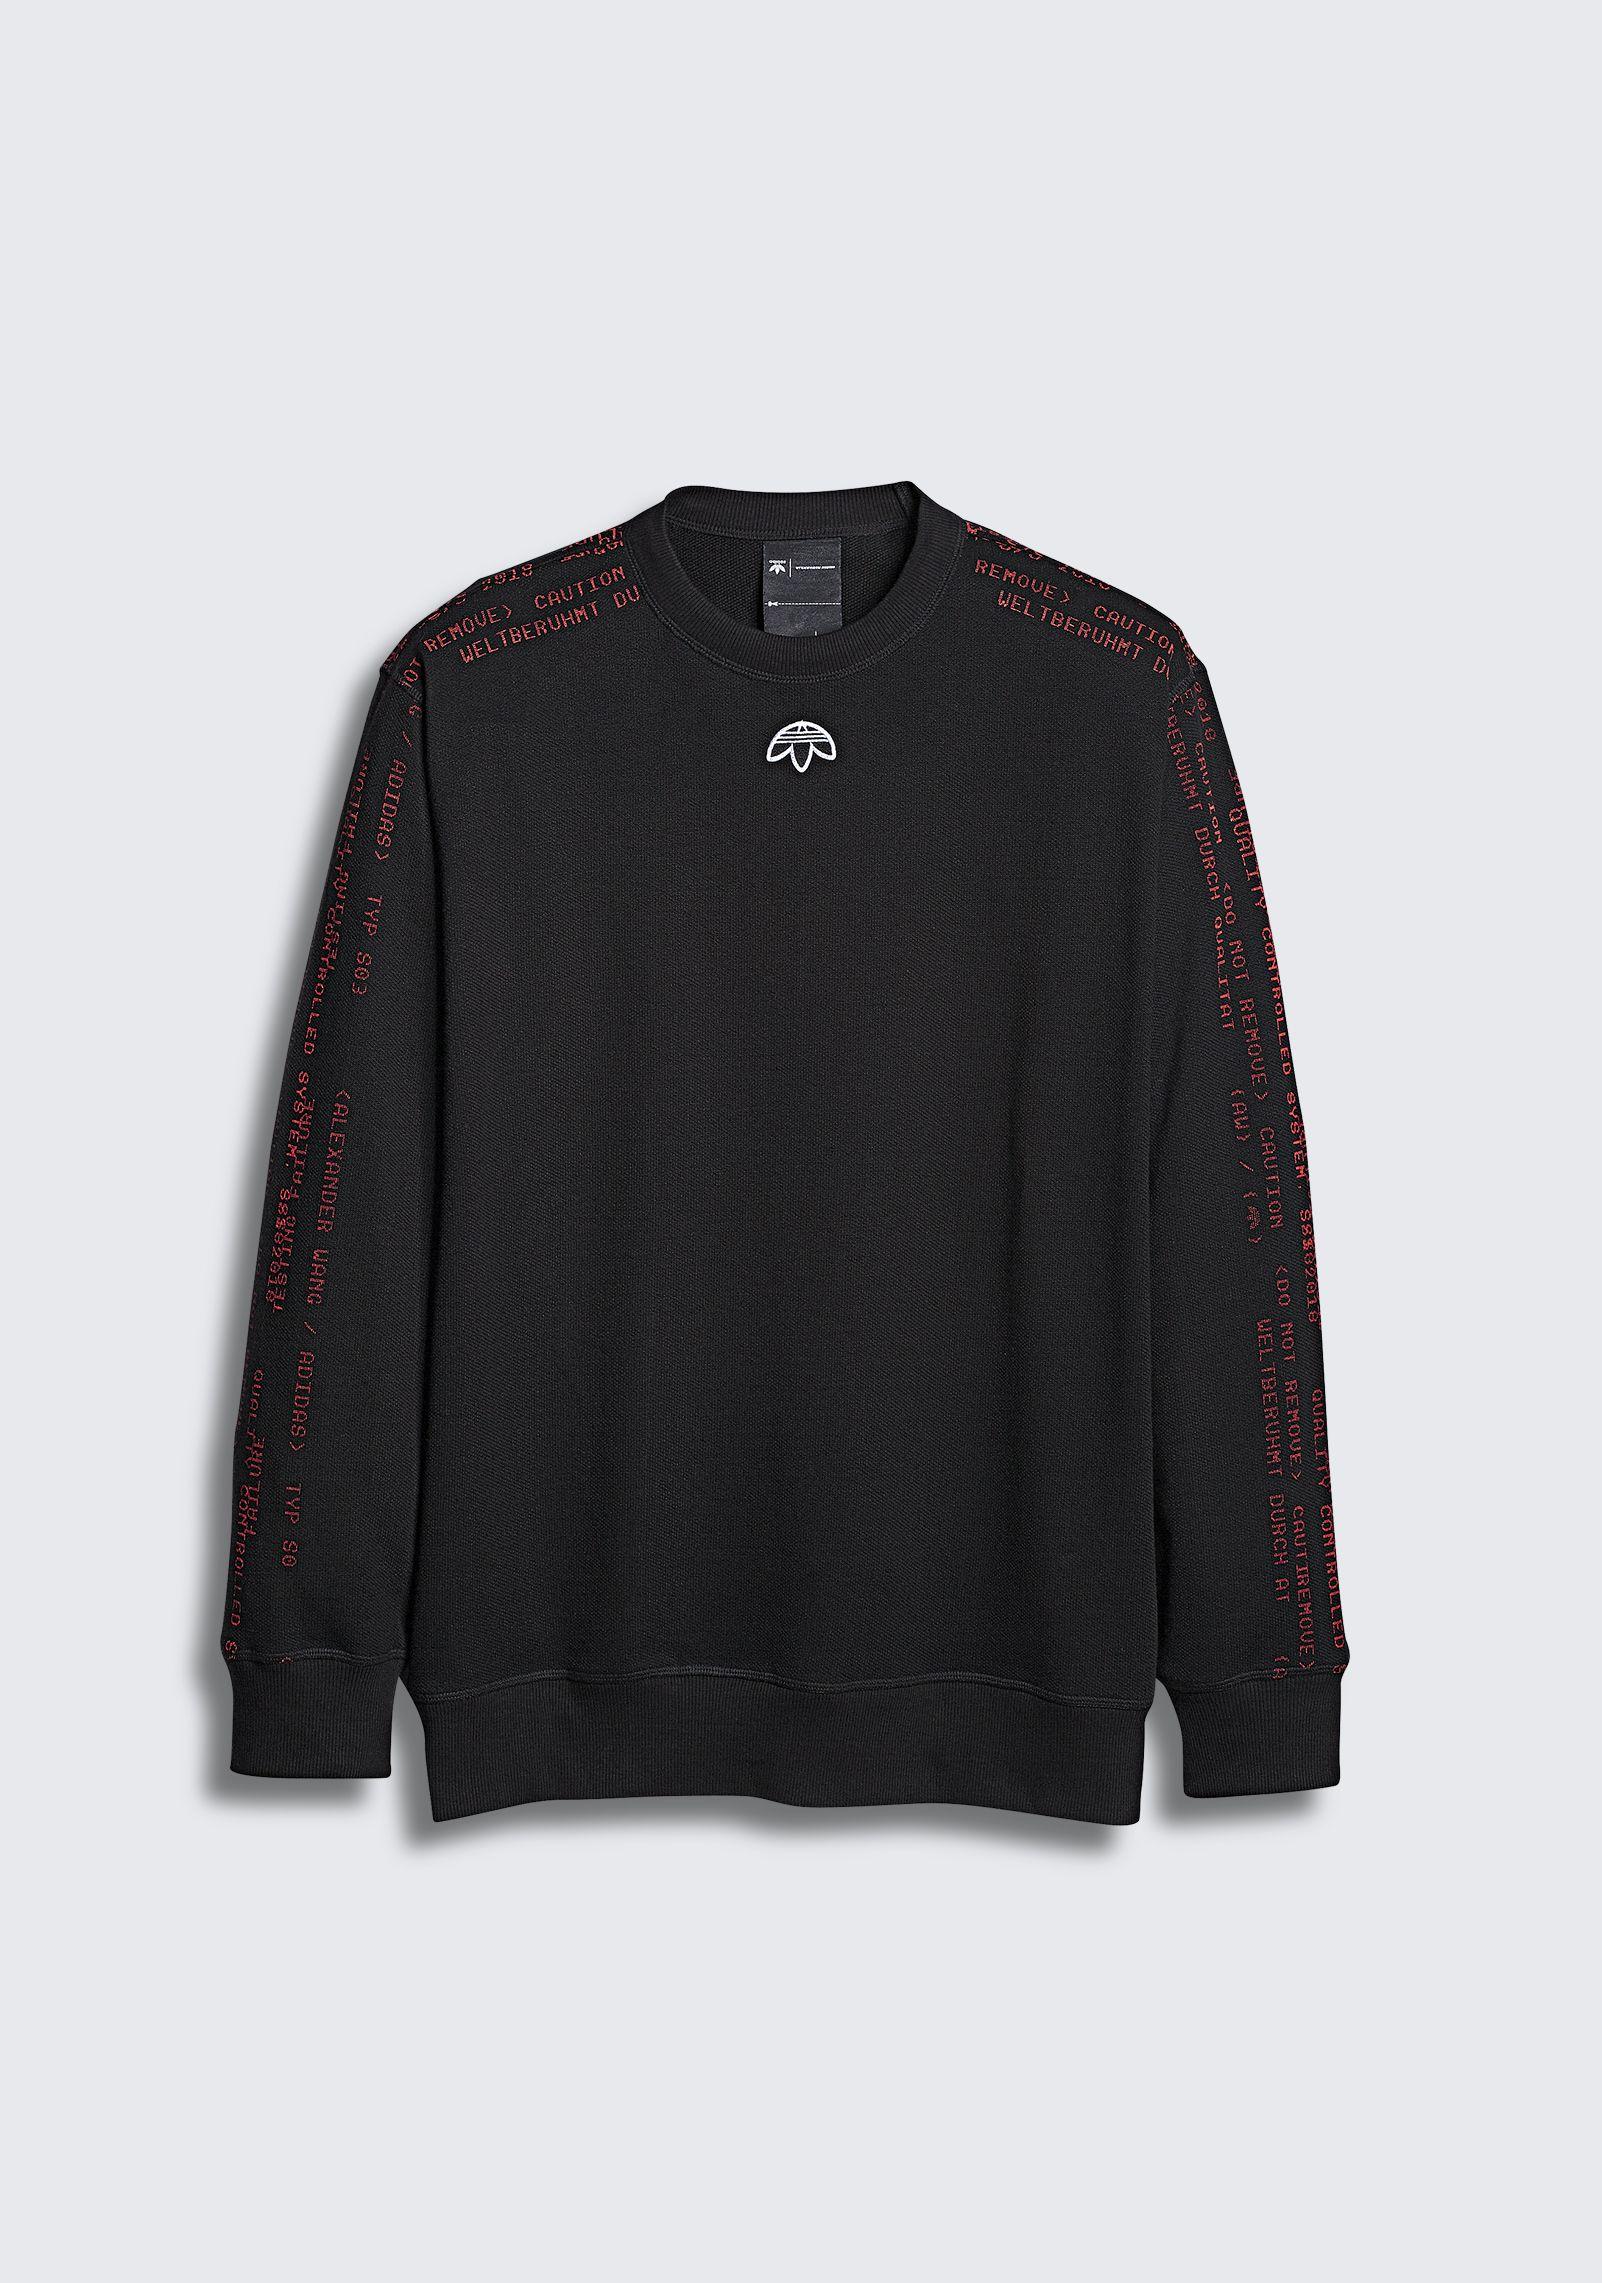 Adidas NYC Graffiti Sweartshirt überall ausverkauft? (Mode